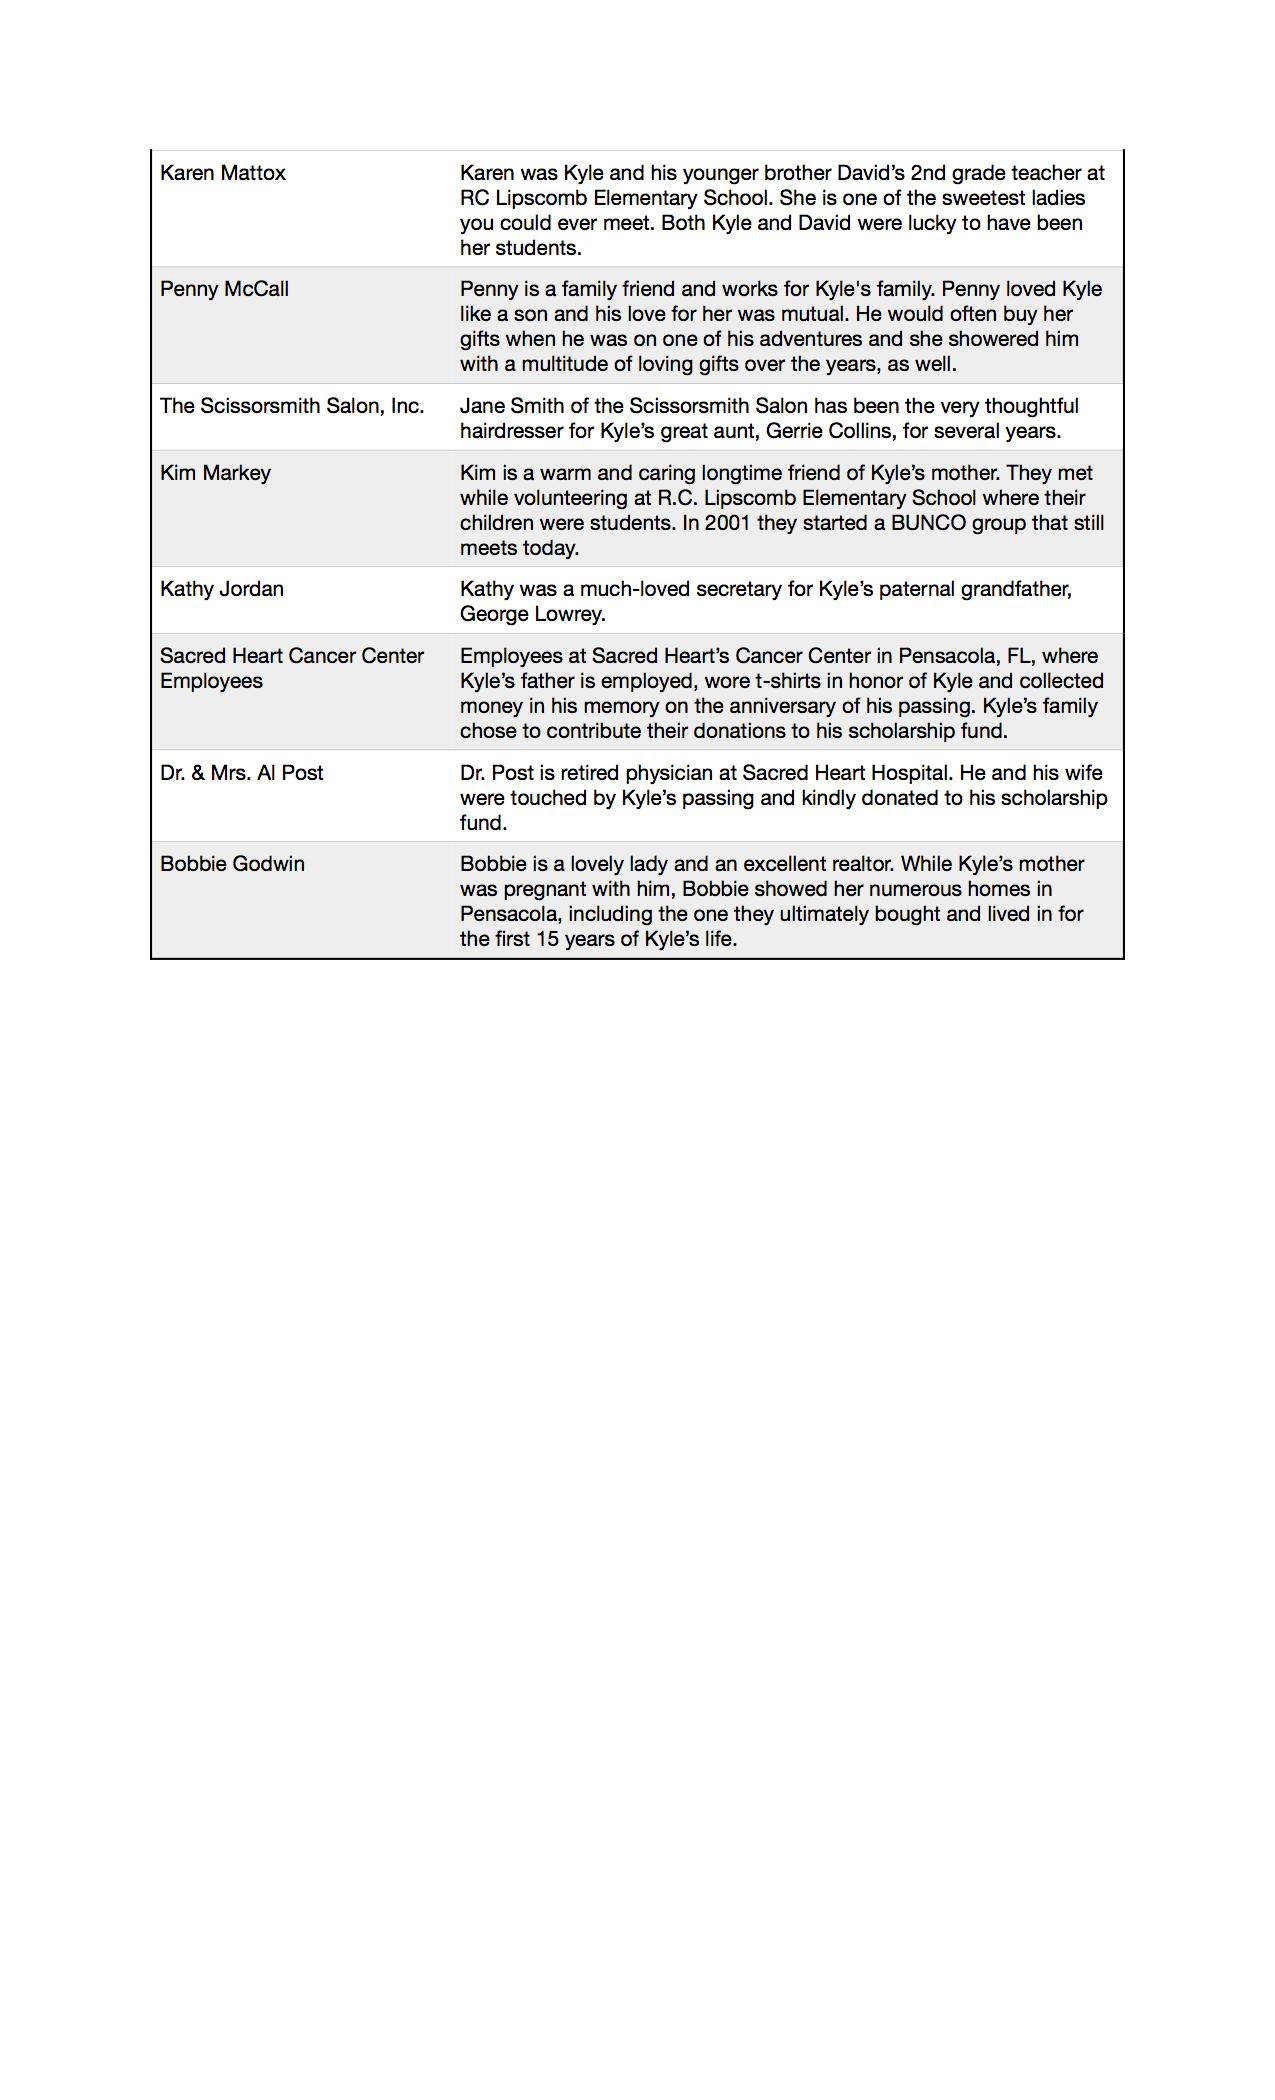 PSC donor list p. 2.jpg